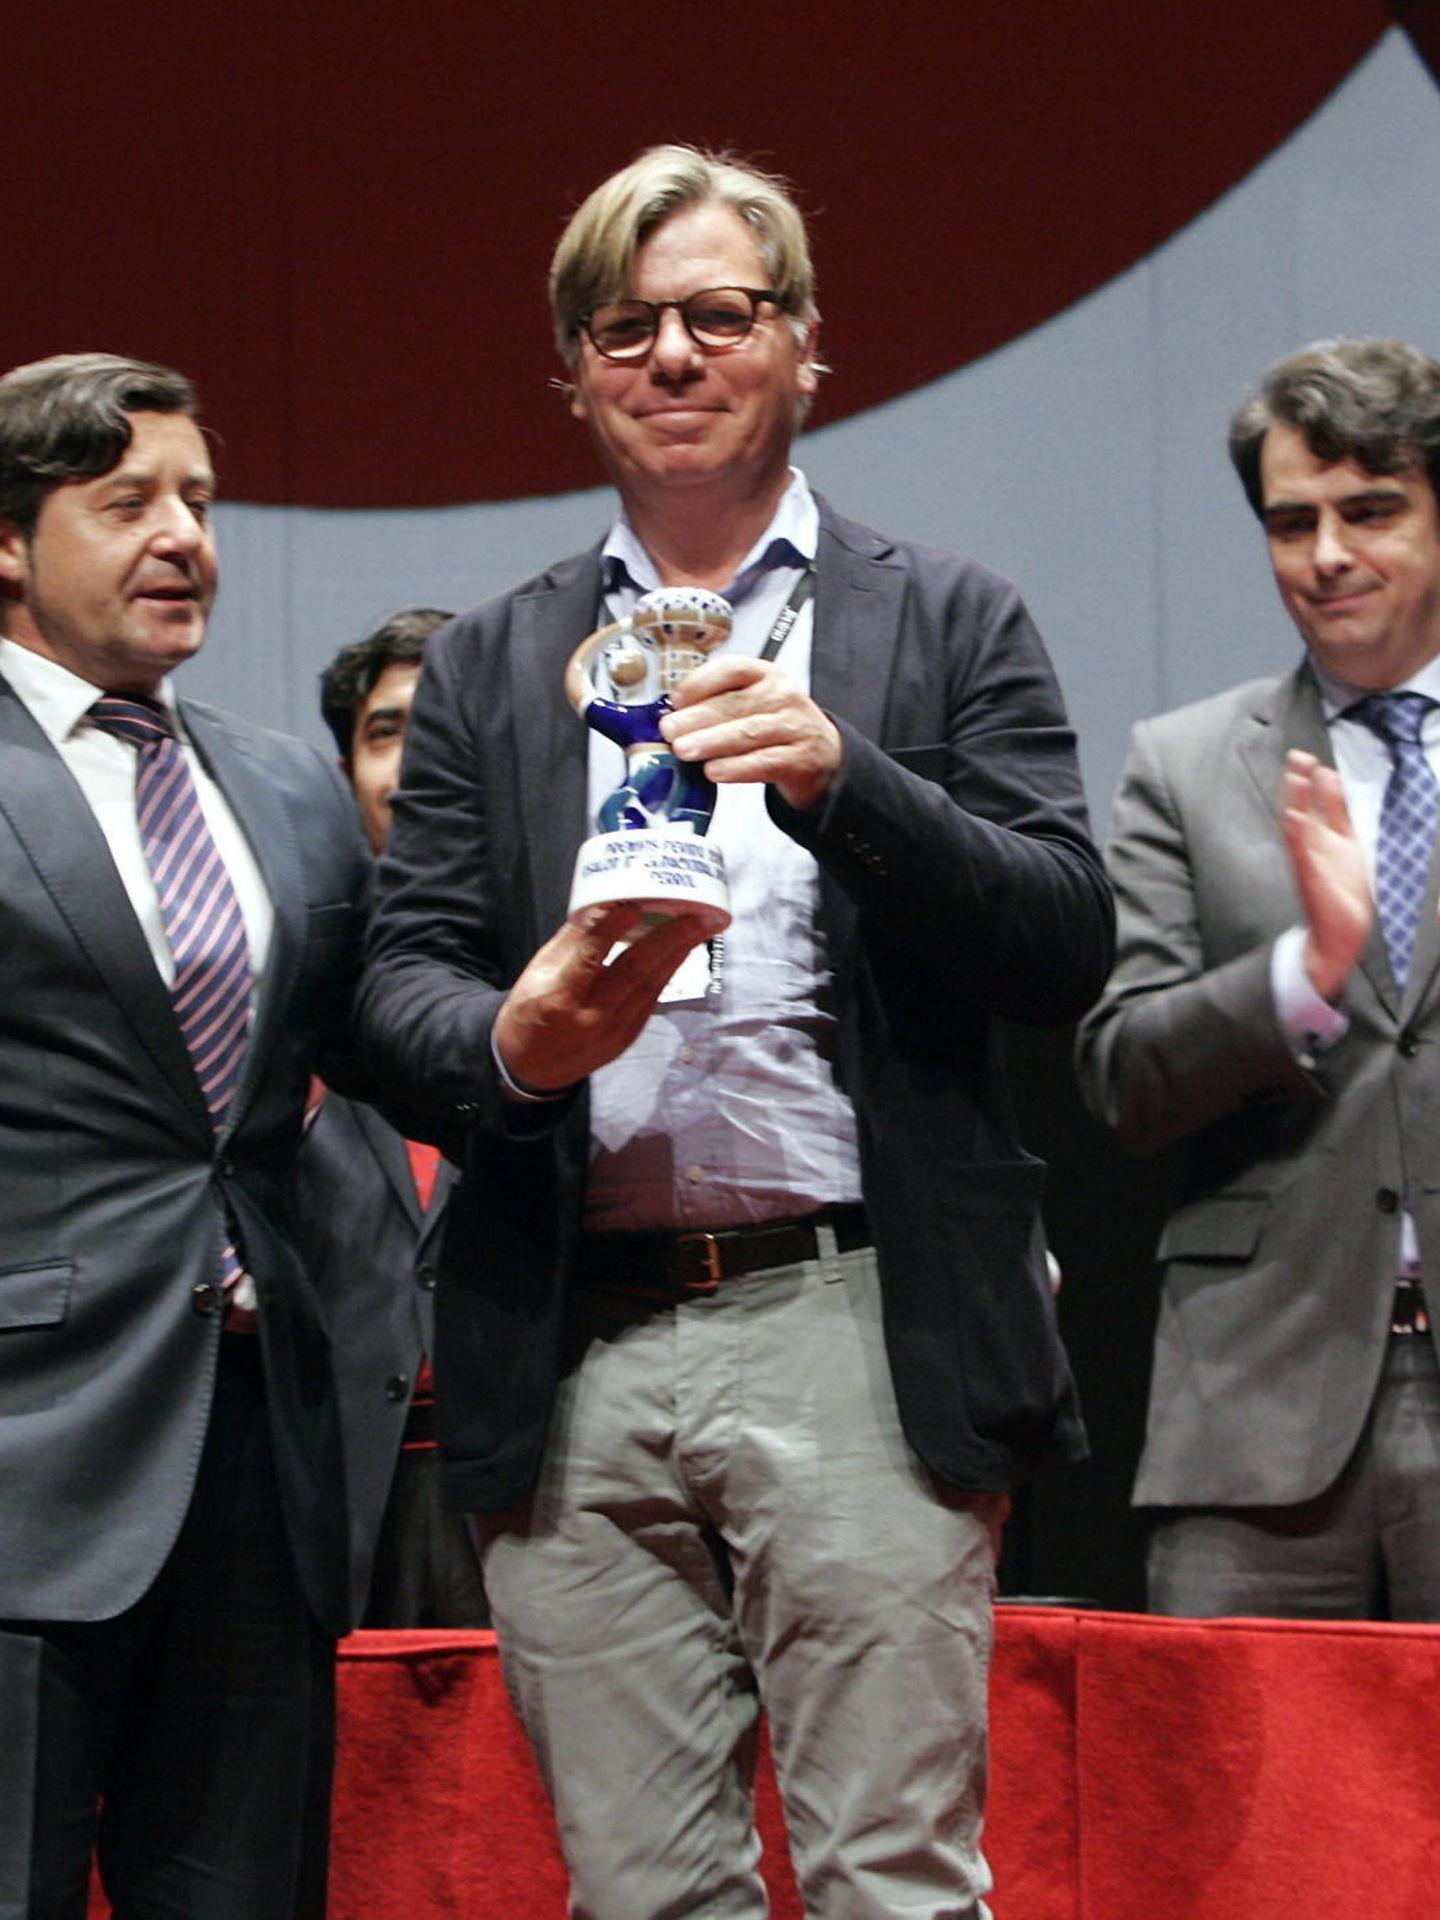 Peter Sisseck, recogiendo un premio. (EFE)